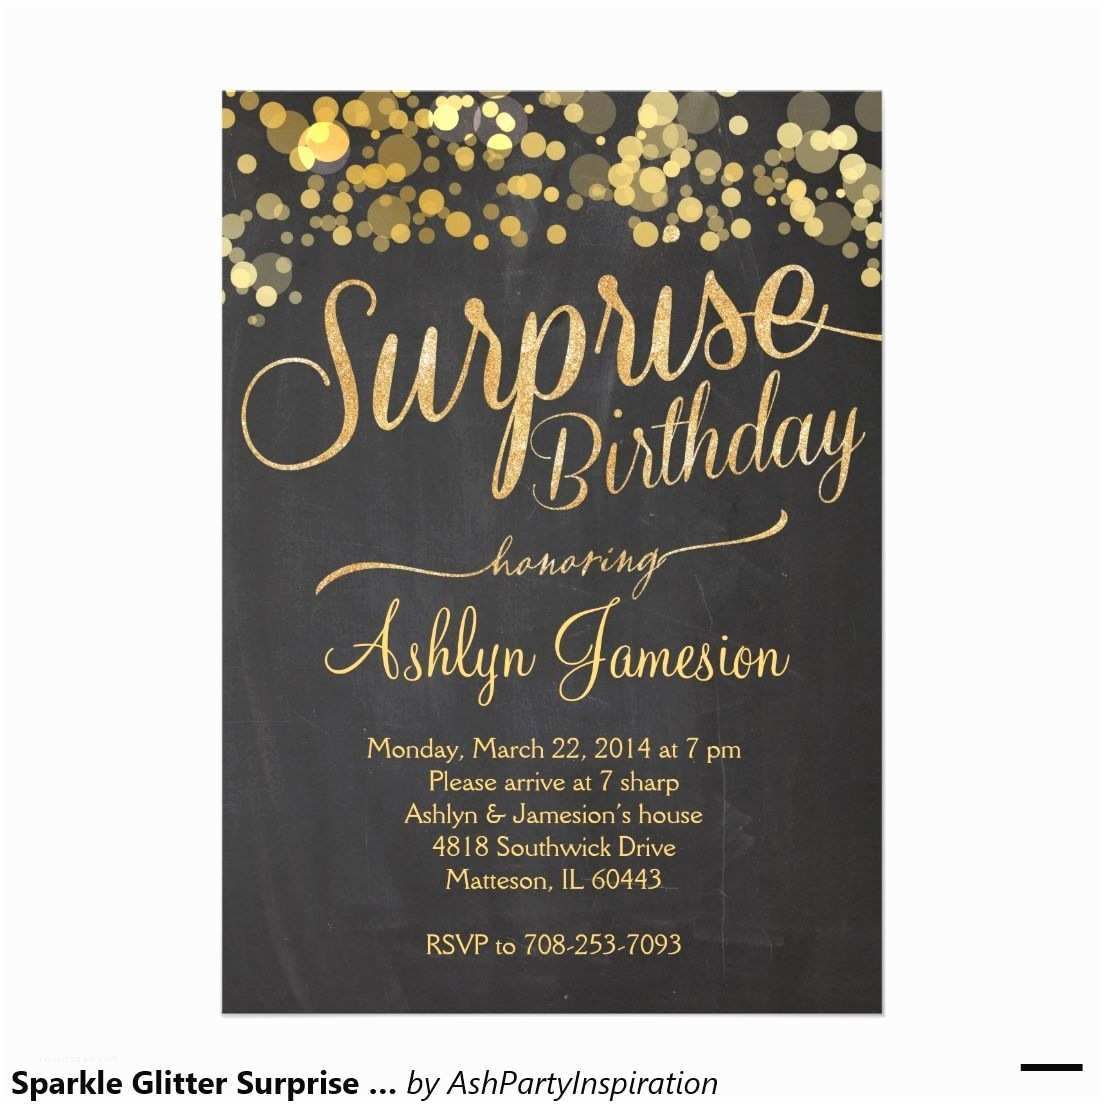 Surprise Party Invitation Sparkle Glitter Surprise Birthday Invitation